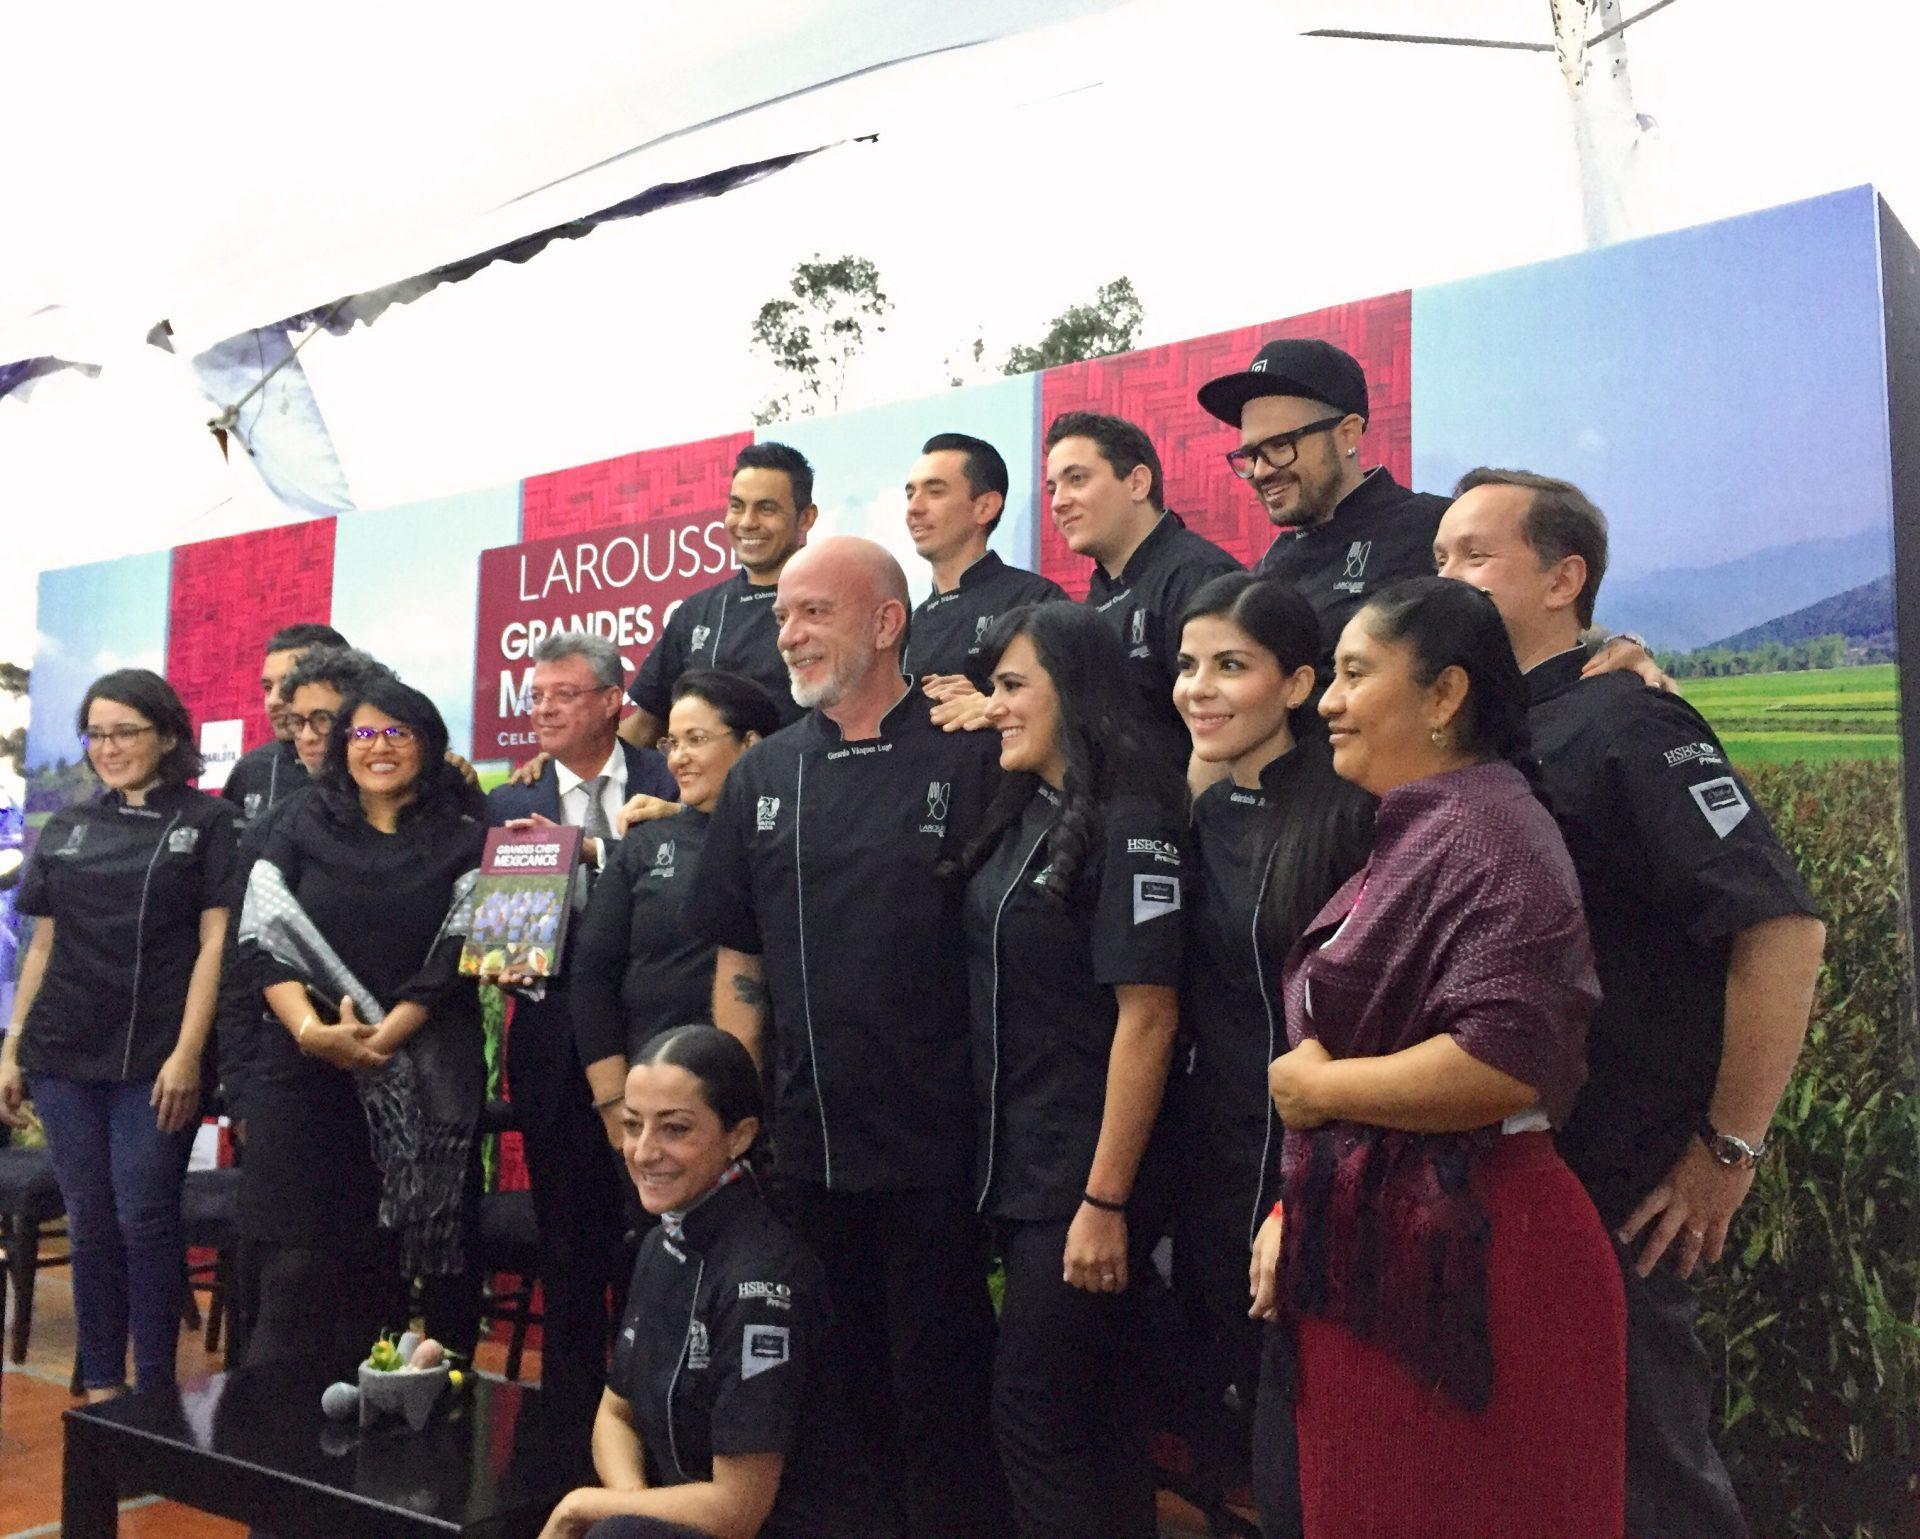 Larousse presenta Grandes Chefs Mexicanos